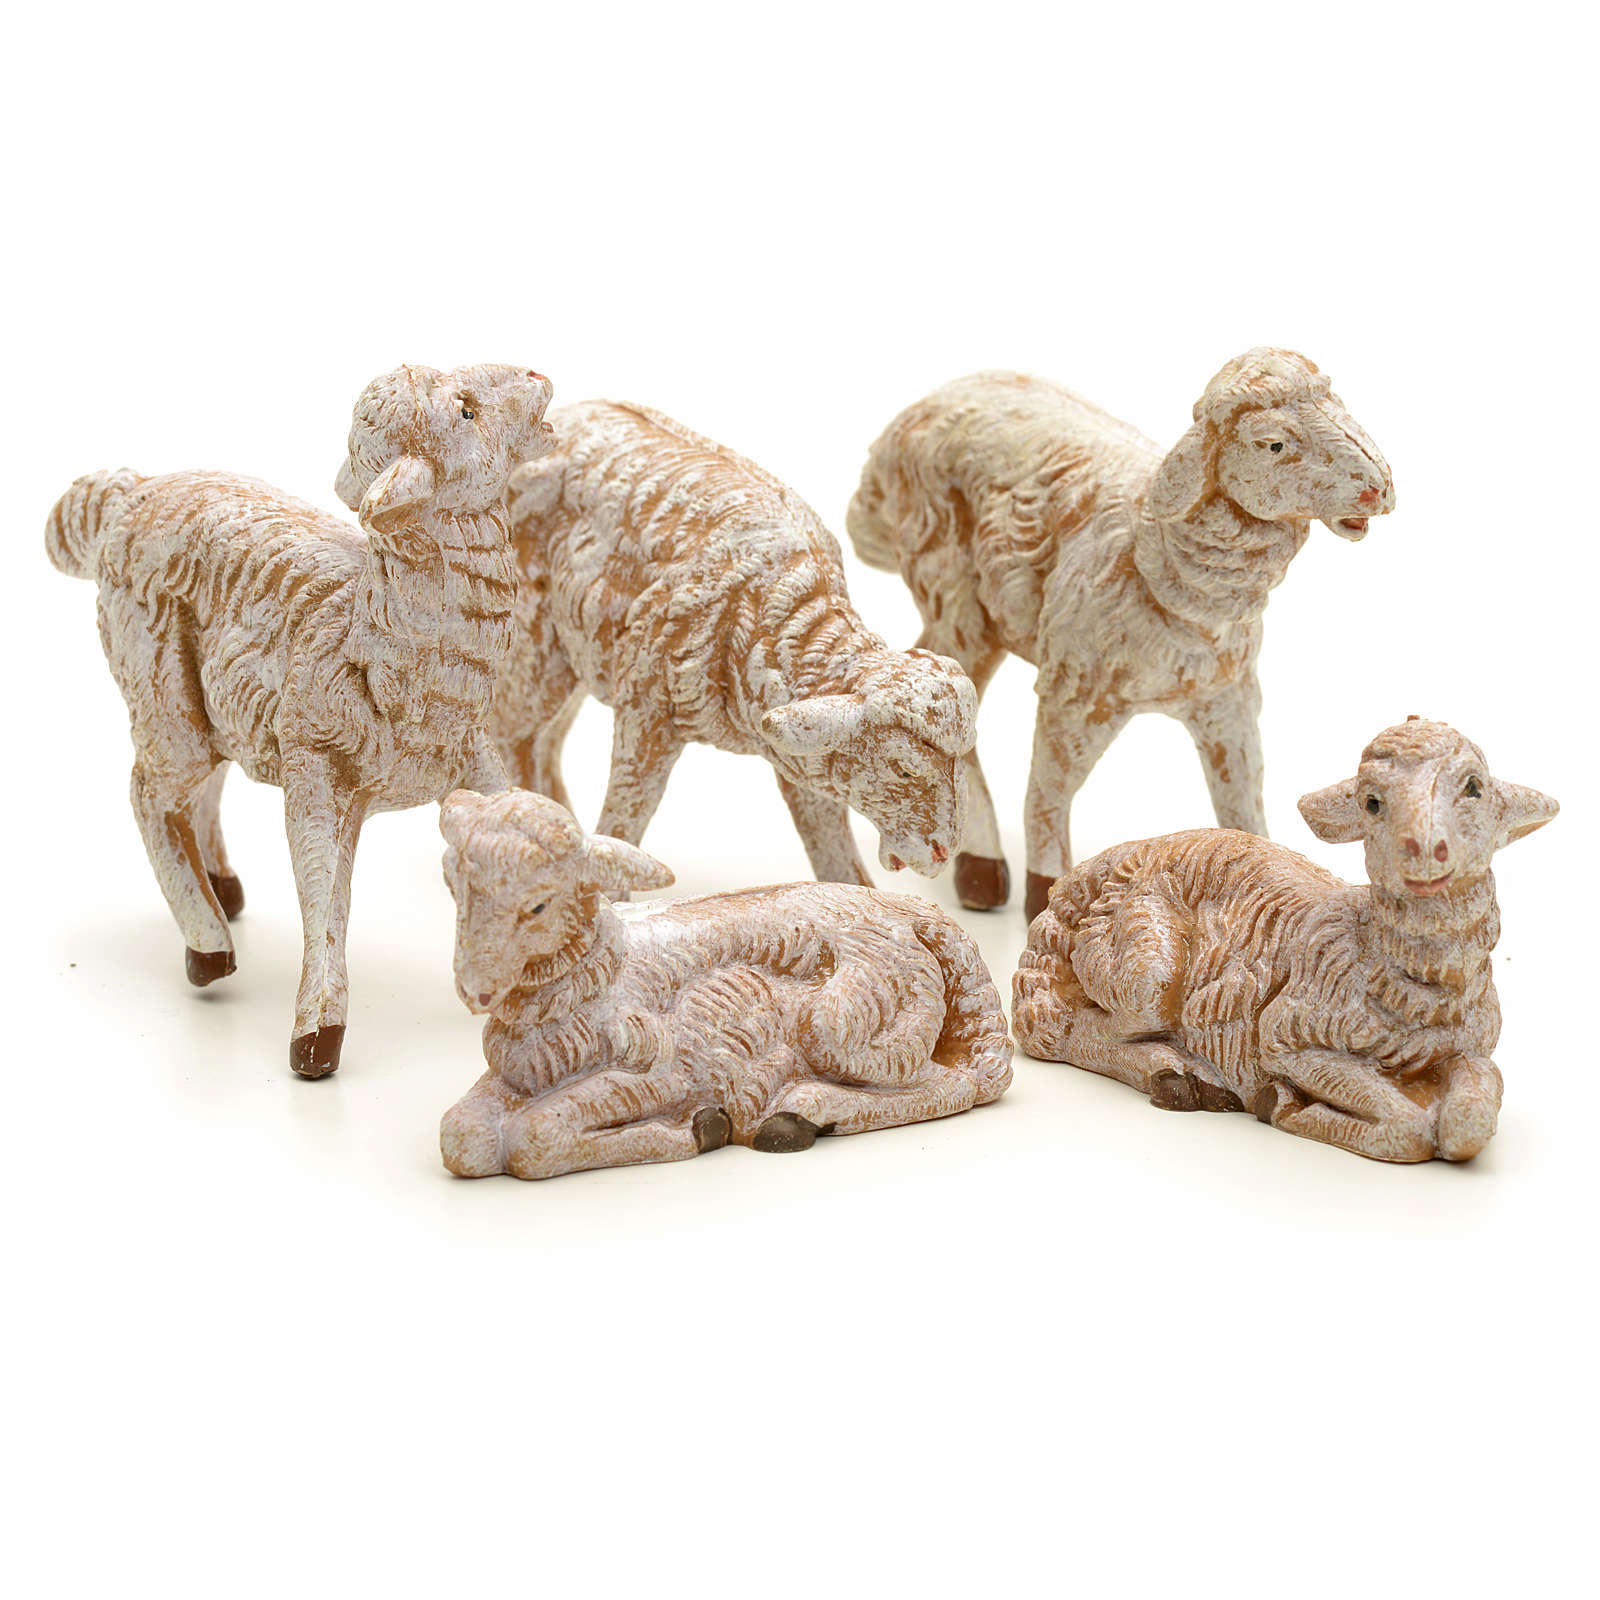 Moutons crèche Fontanini 12 cm 5 pcs 3